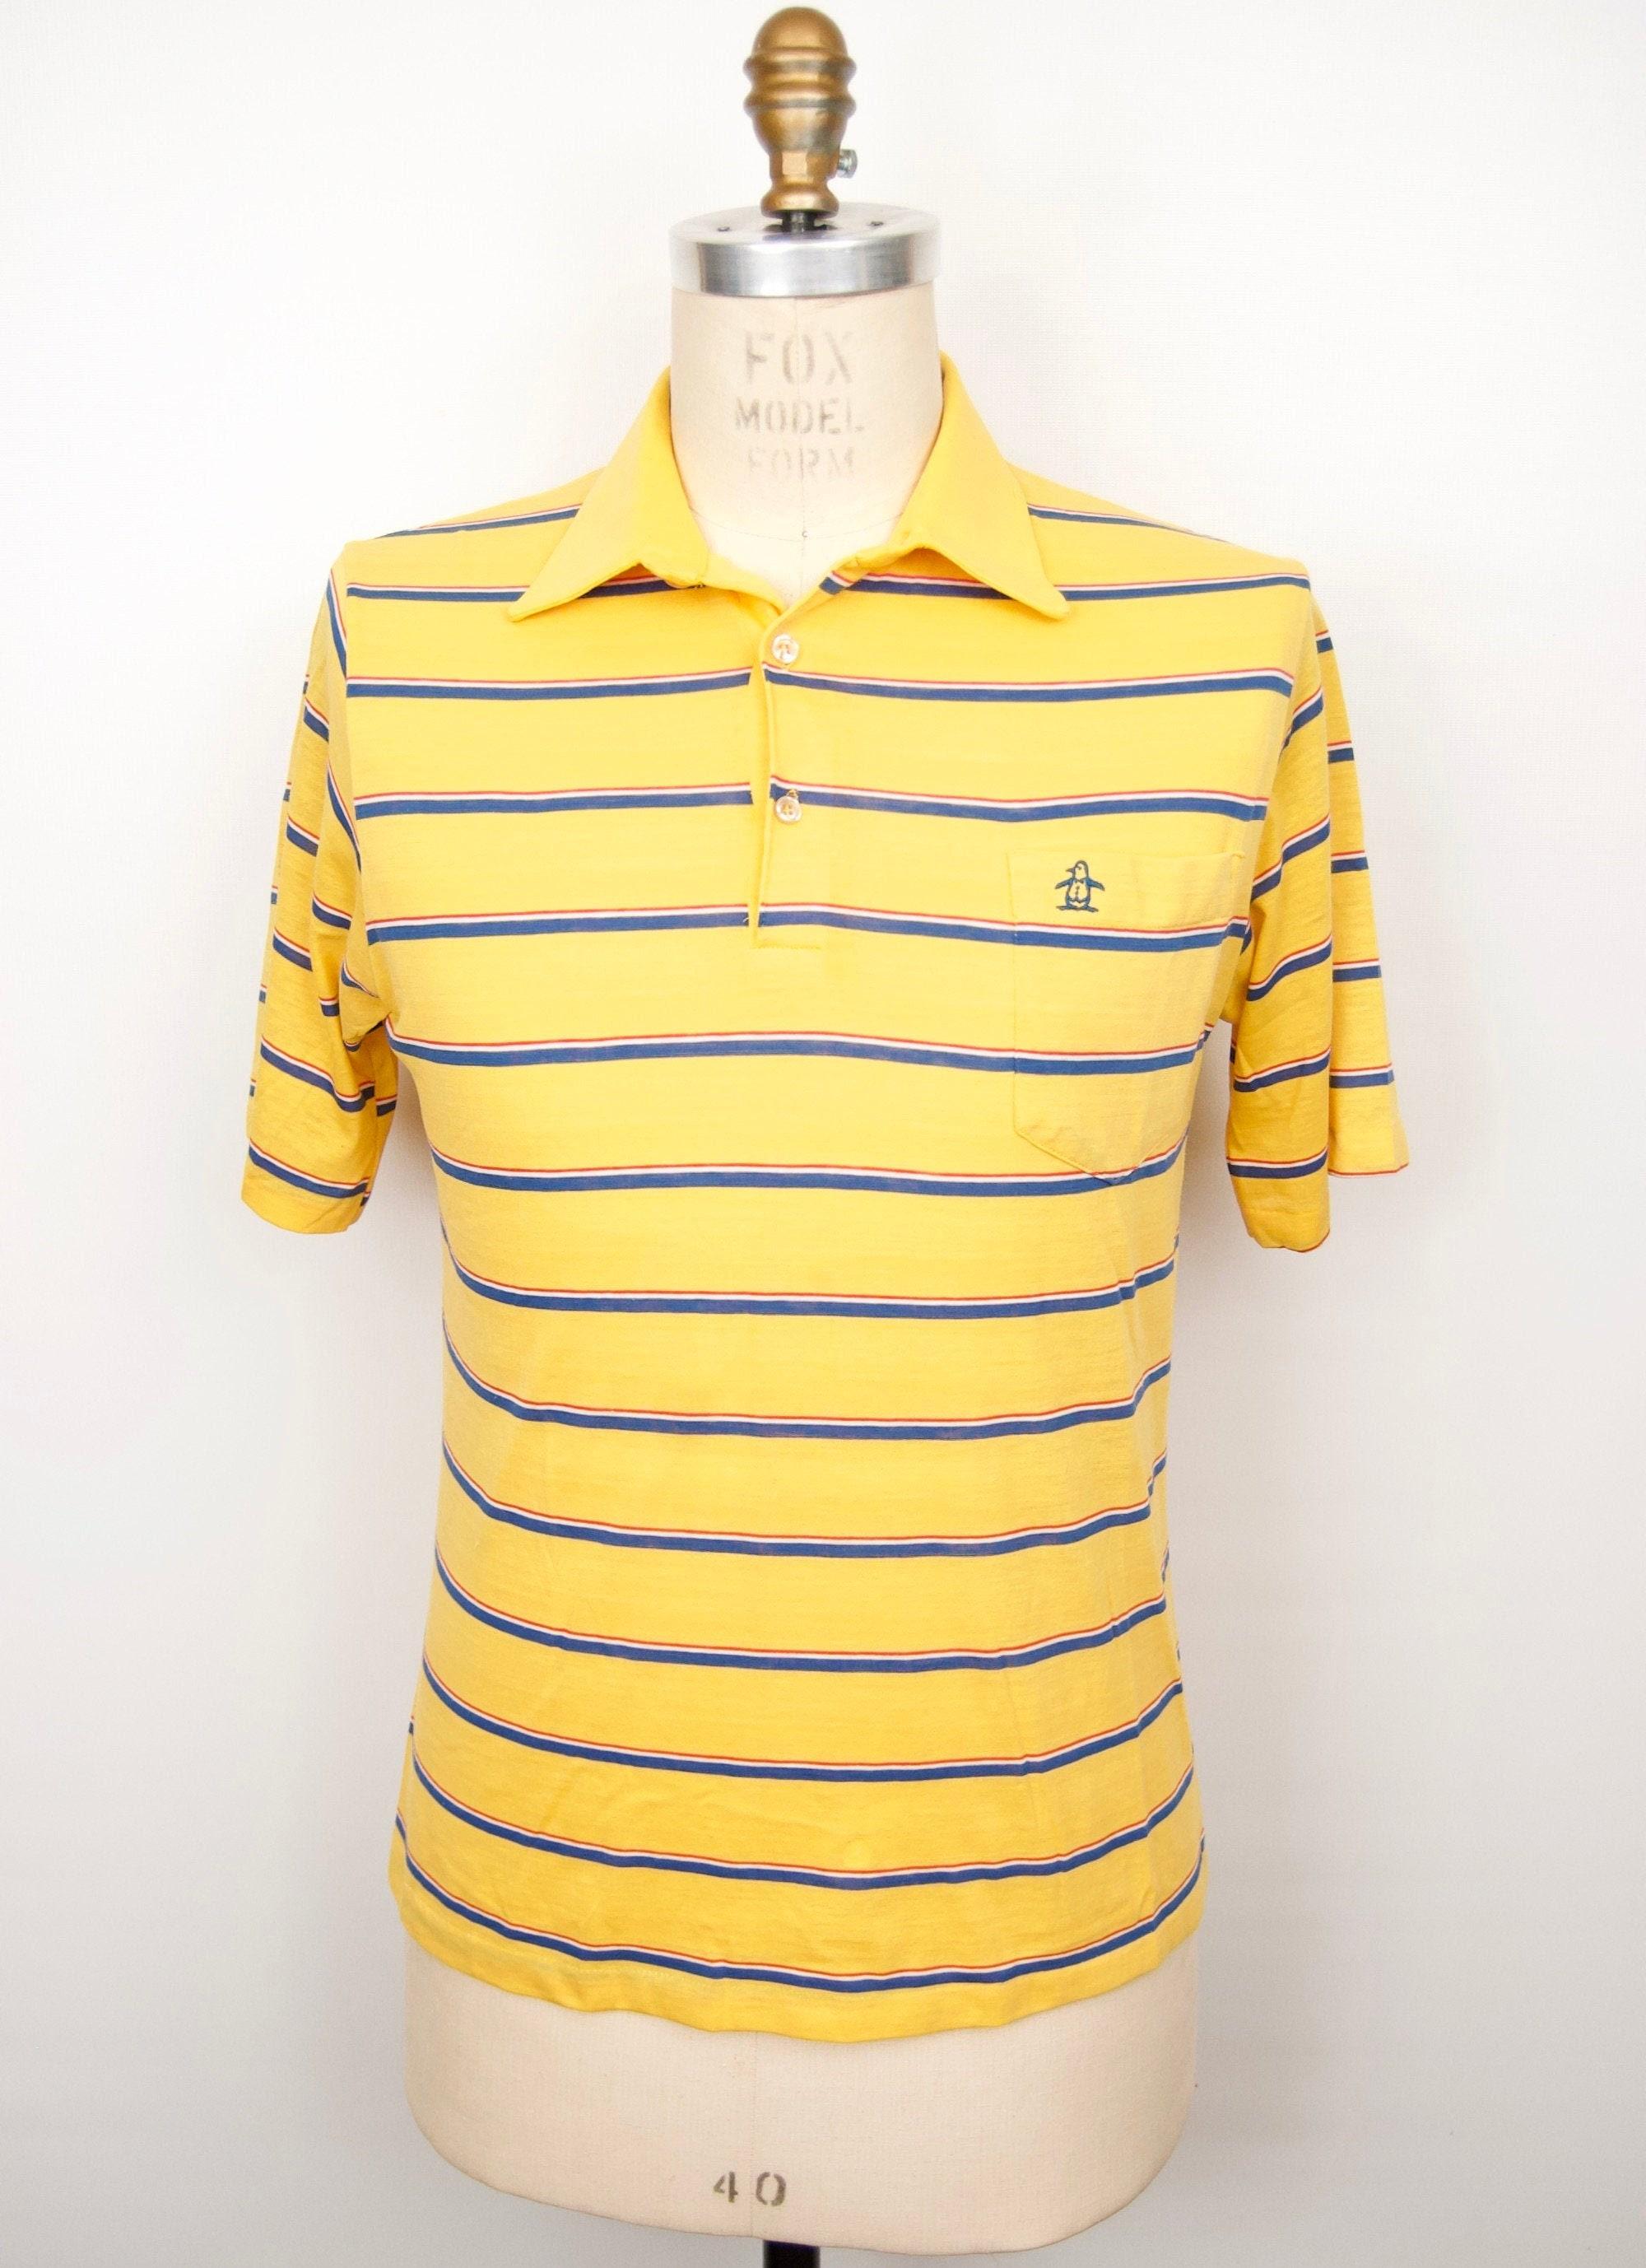 1970s Men's Shirt Styles – Vintage 70s Shirts for Guys 1980S Munsingwear Polo ShirtPenguin Logo Grand Slam Stripe Tennis Or Golf Shirt Medium-Large $34.00 AT vintagedancer.com